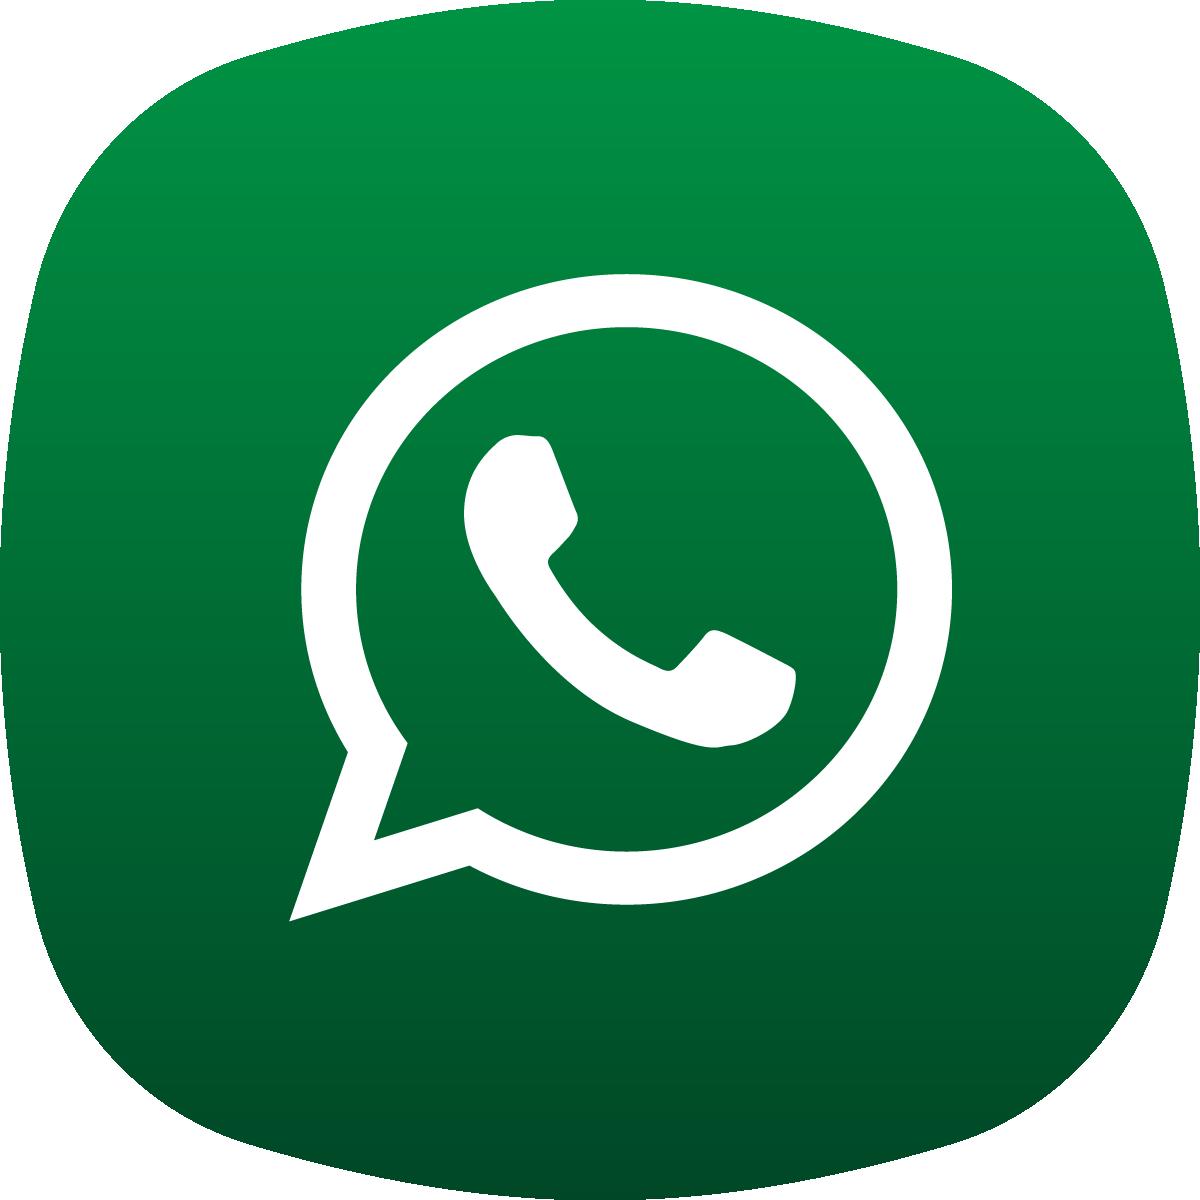 —Pngtree—whatsapp icon png whatsapp logo_3562015